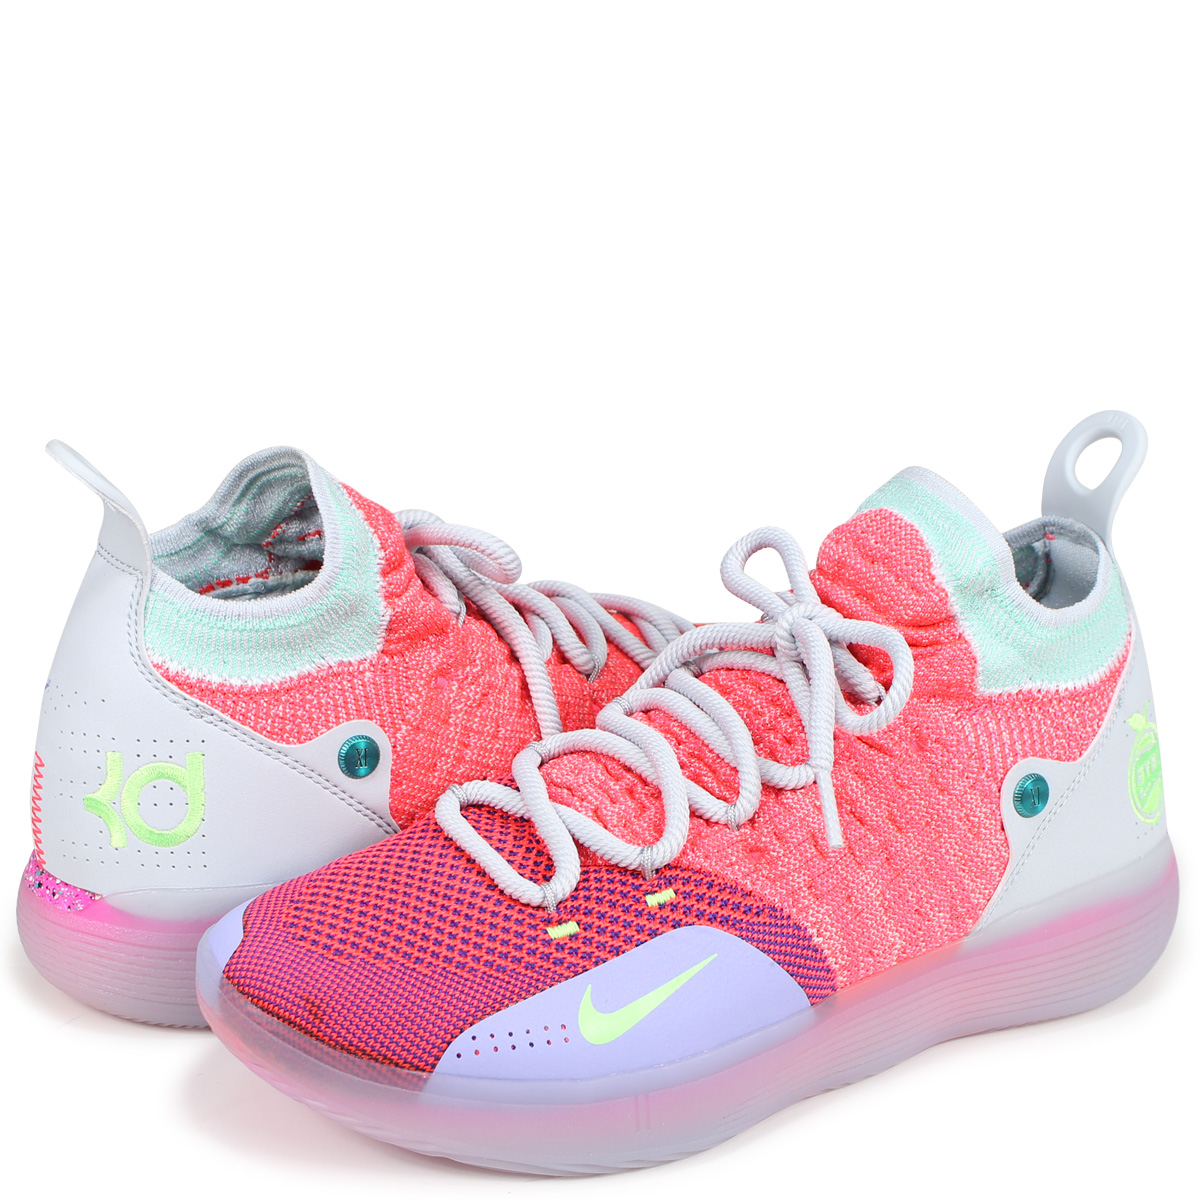 cacf963be90e ALLSPORTS  NIKE ZOOM KD 11 EP Nike KD11 sneakers men A02605-600 pink ...